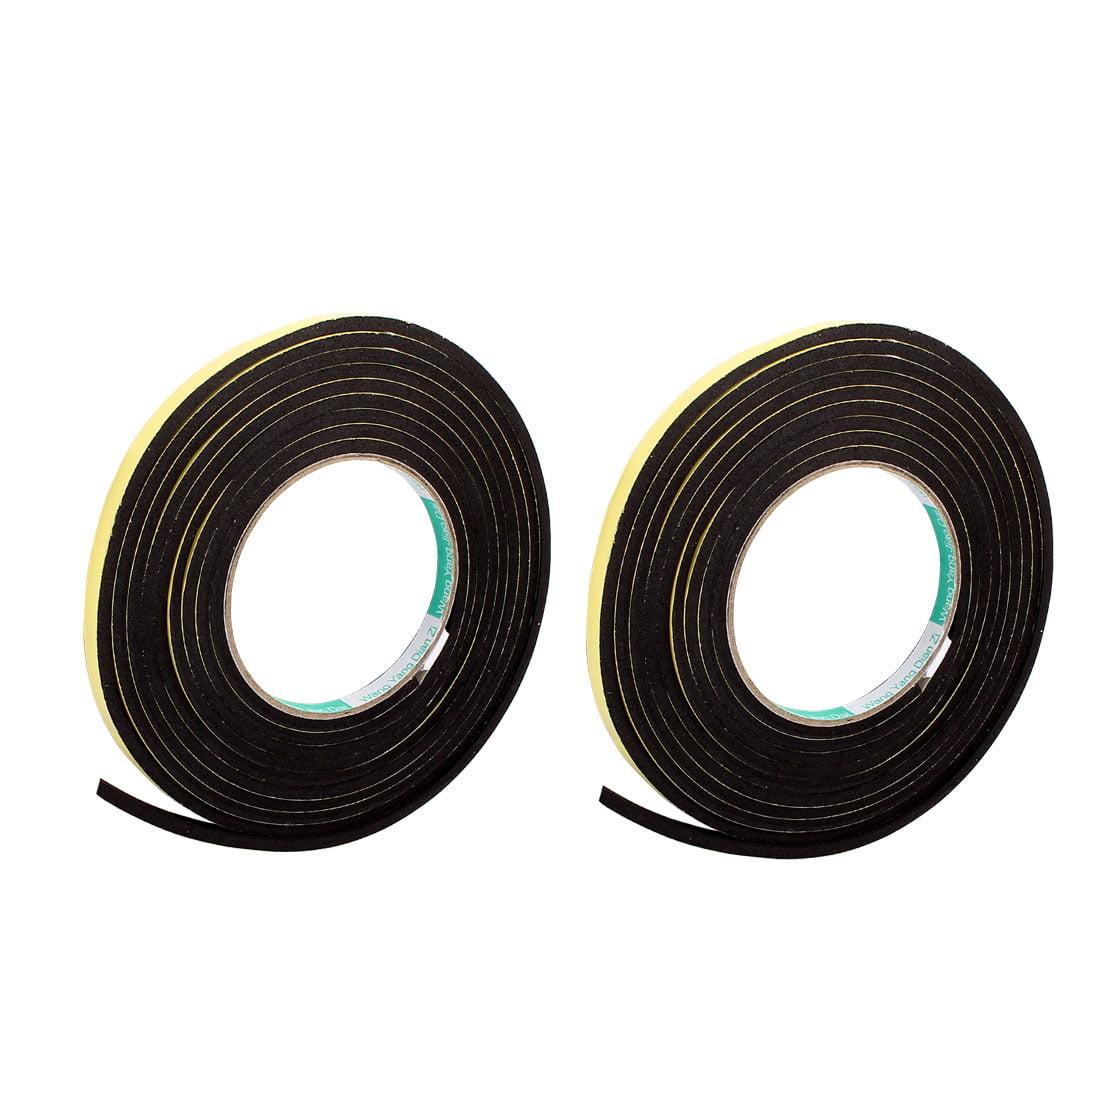 2Pcs 5MM Width 3.5M Length 3MM Thick Single Sided Sealing Shockproof Sponge Tape